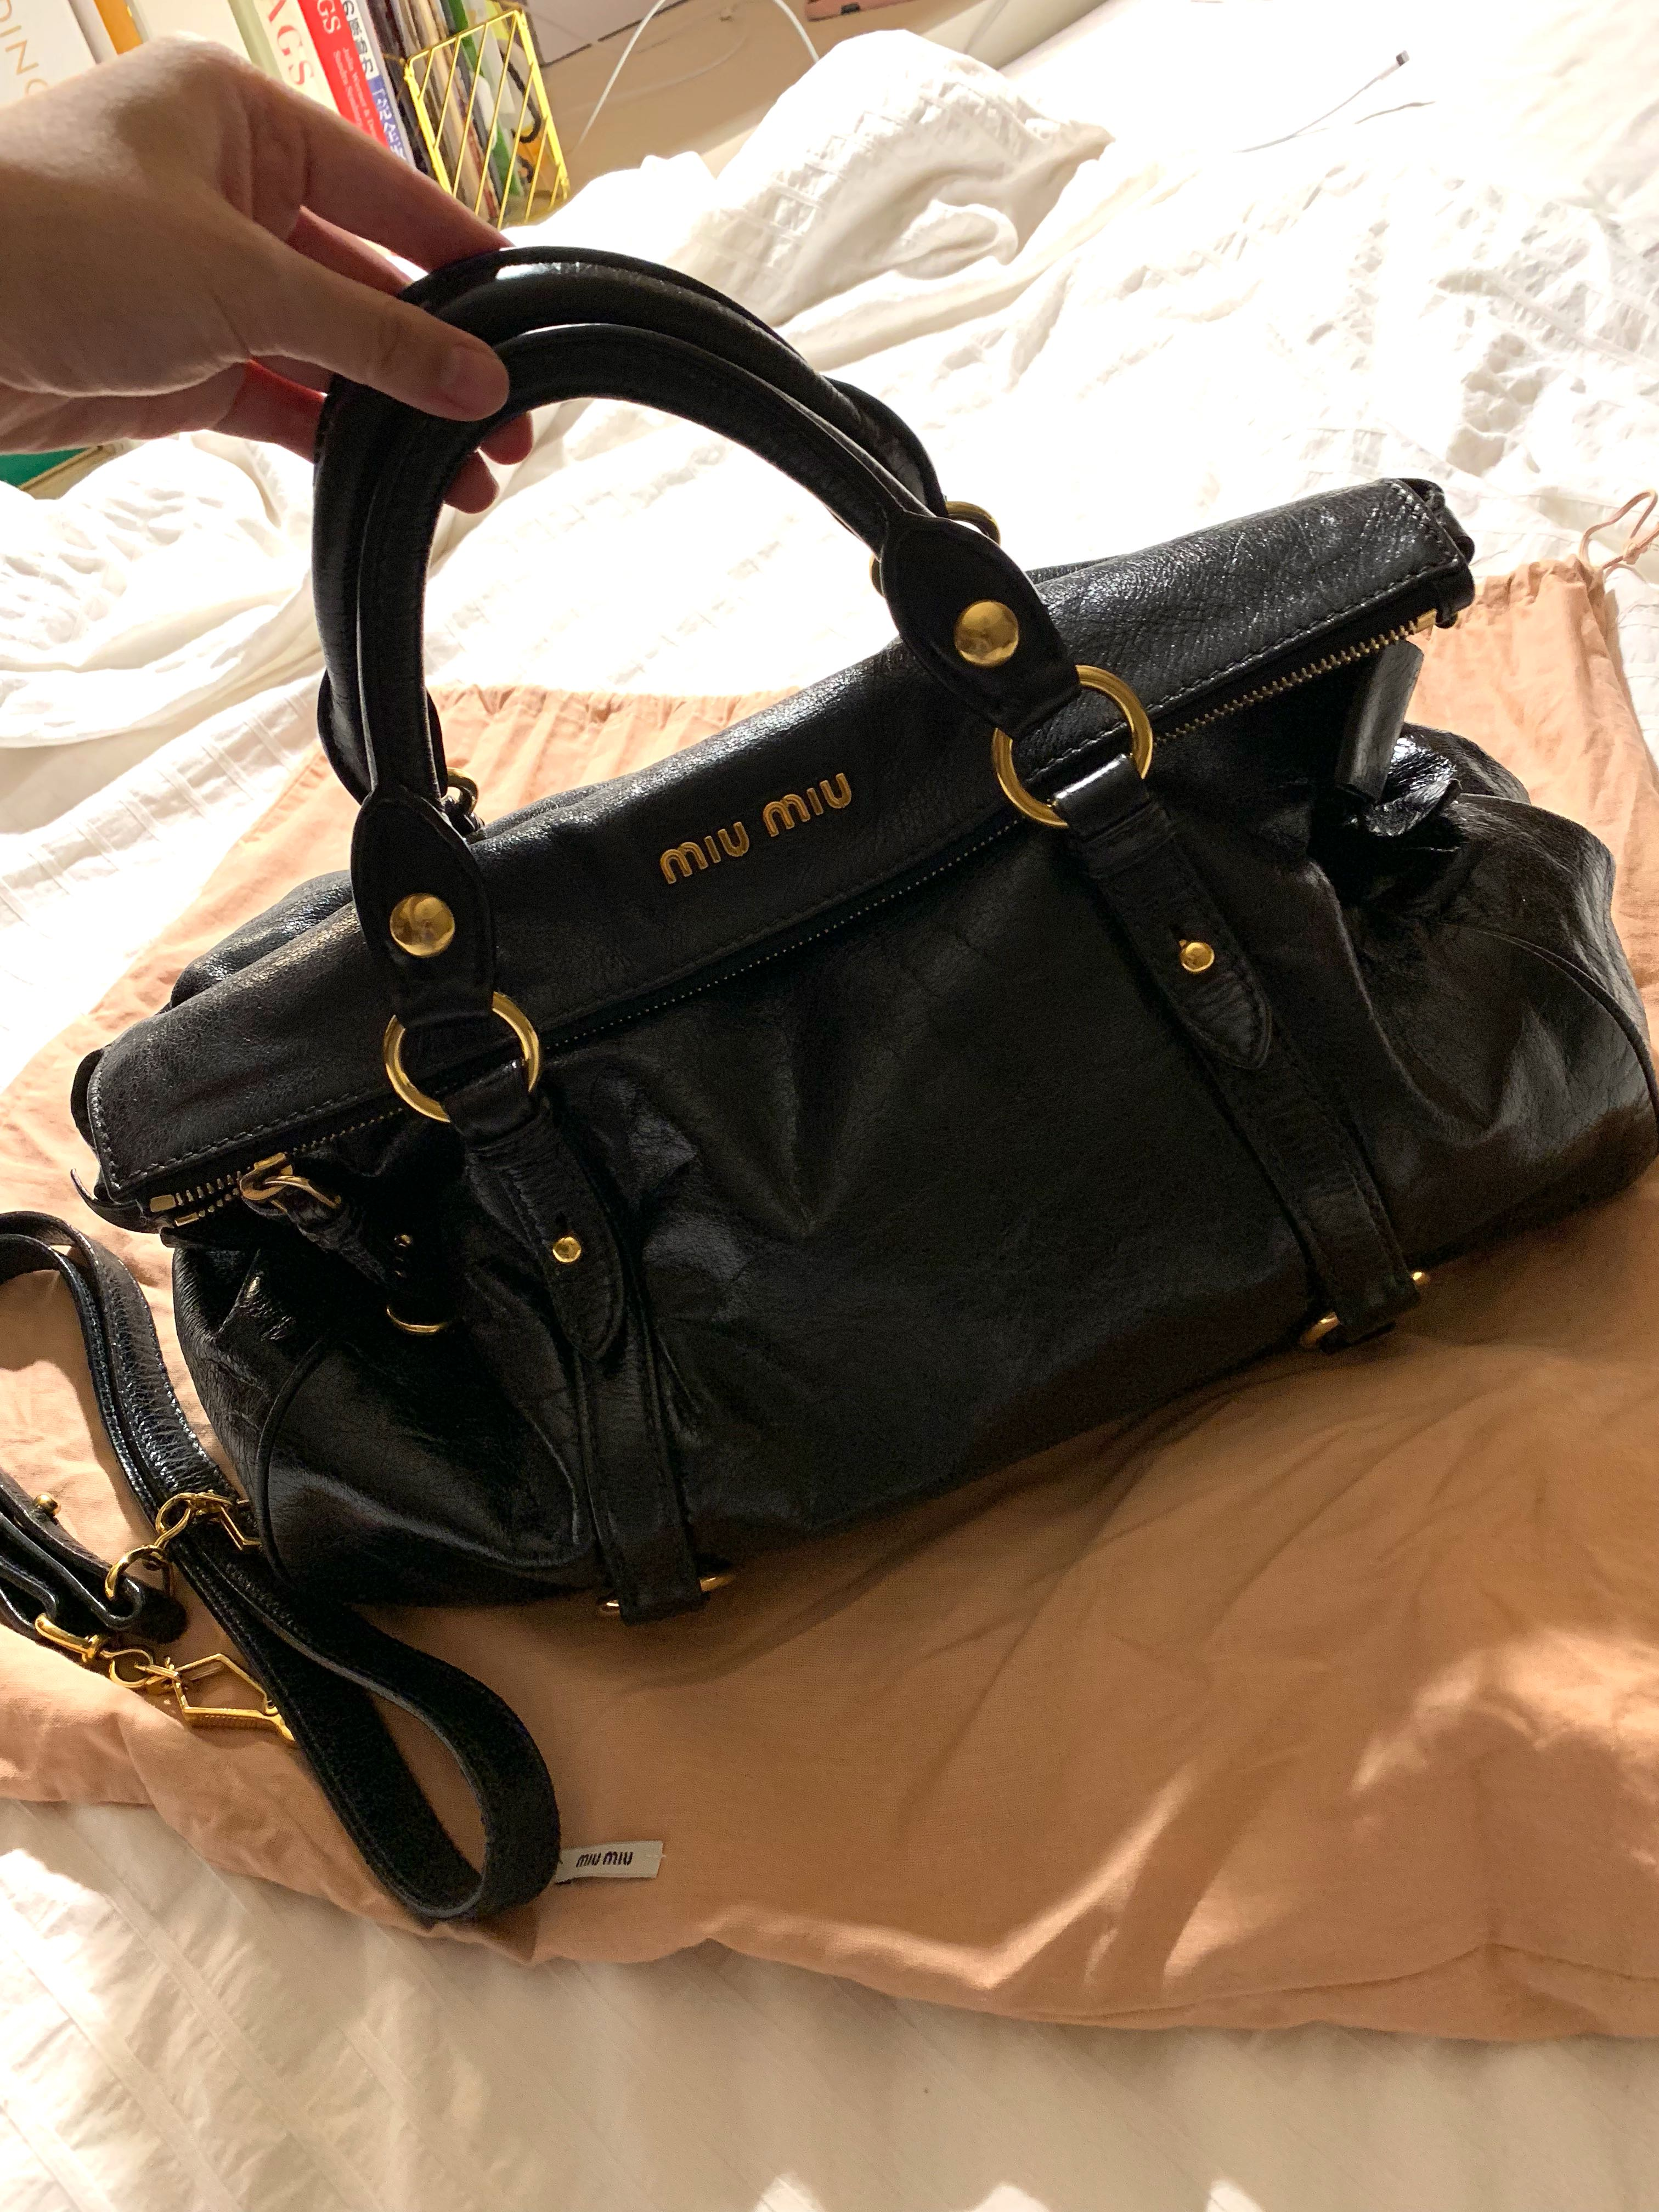 846201c7012 Miu Miu Vitello Lux Bow Bag